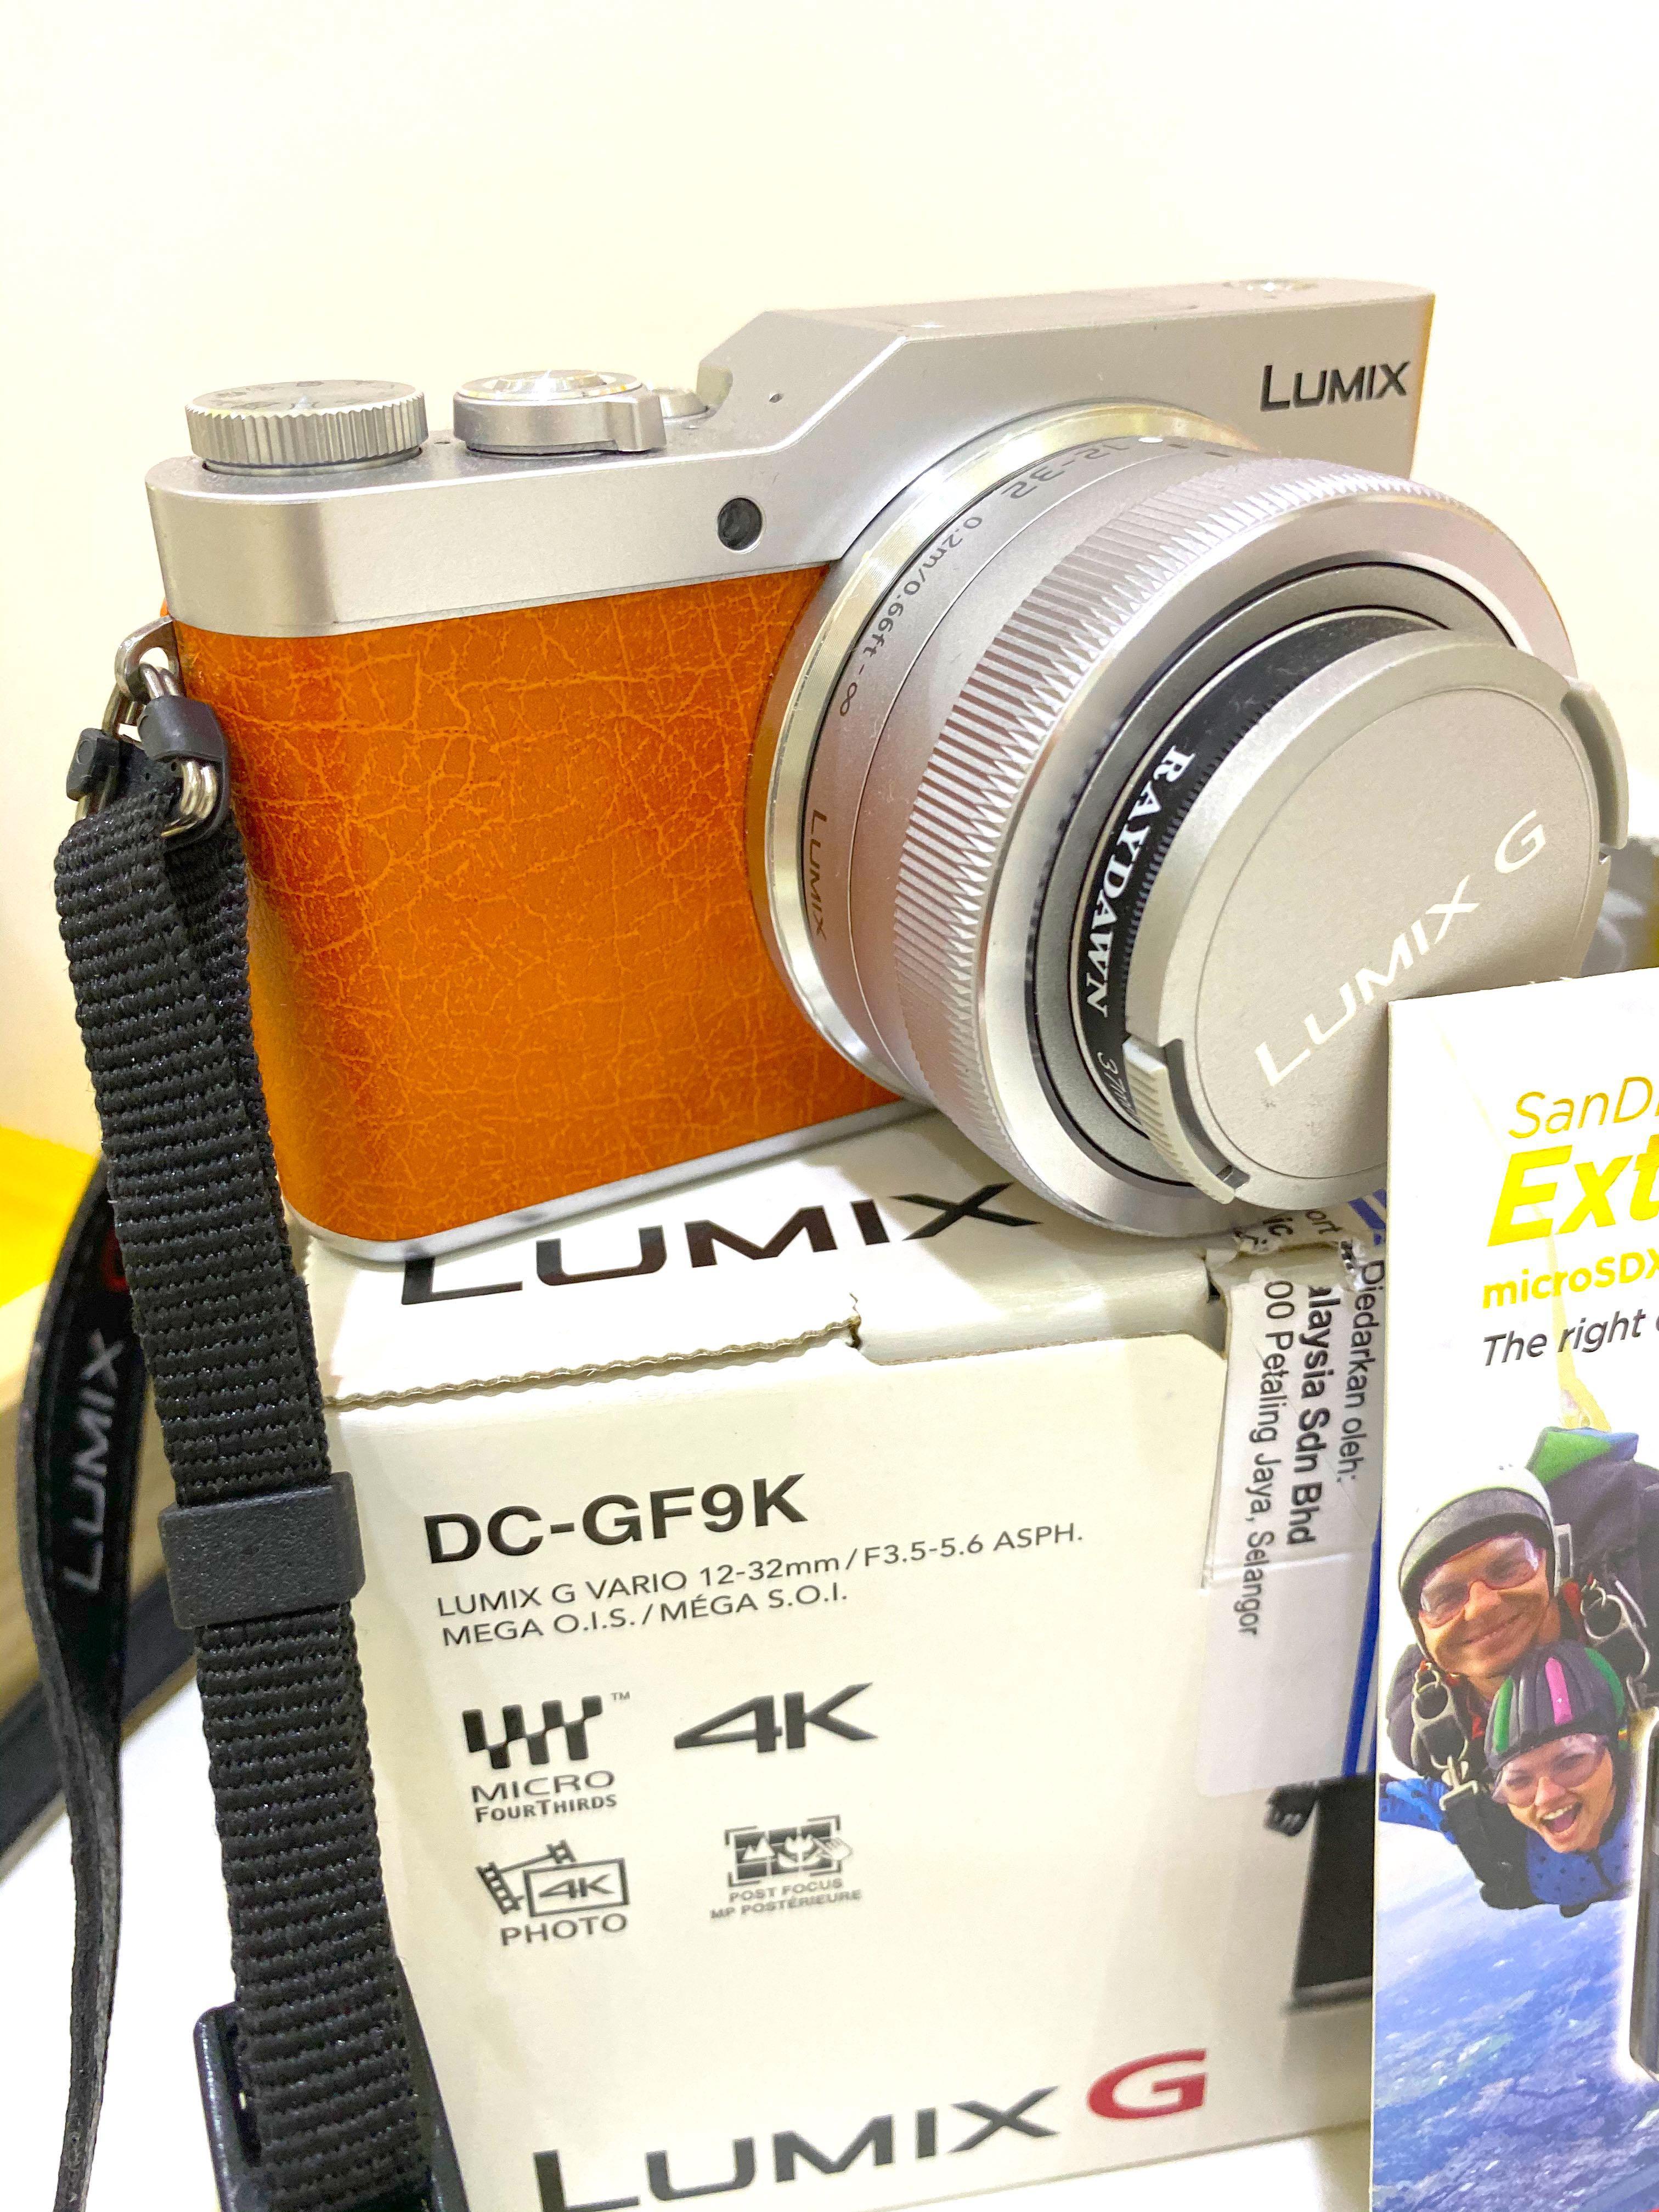 Lumix DC- GF9K